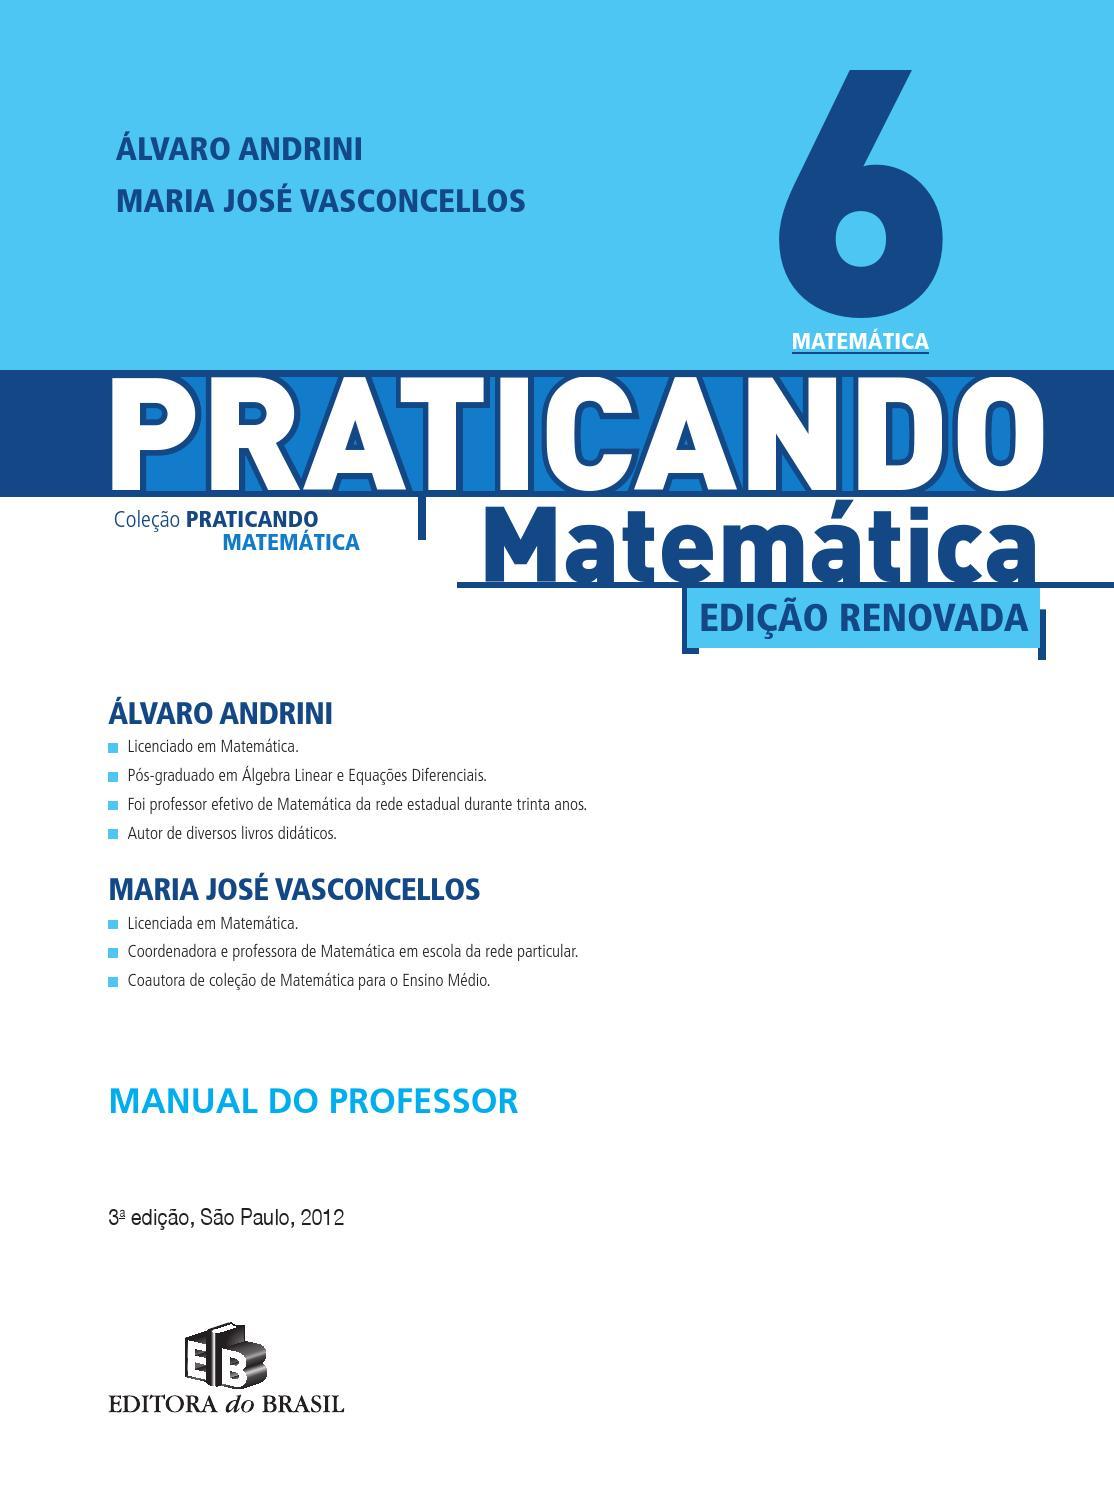 Praticando matematica 6ano by ronaldo.cardoso - issuu 39f5843a0f4